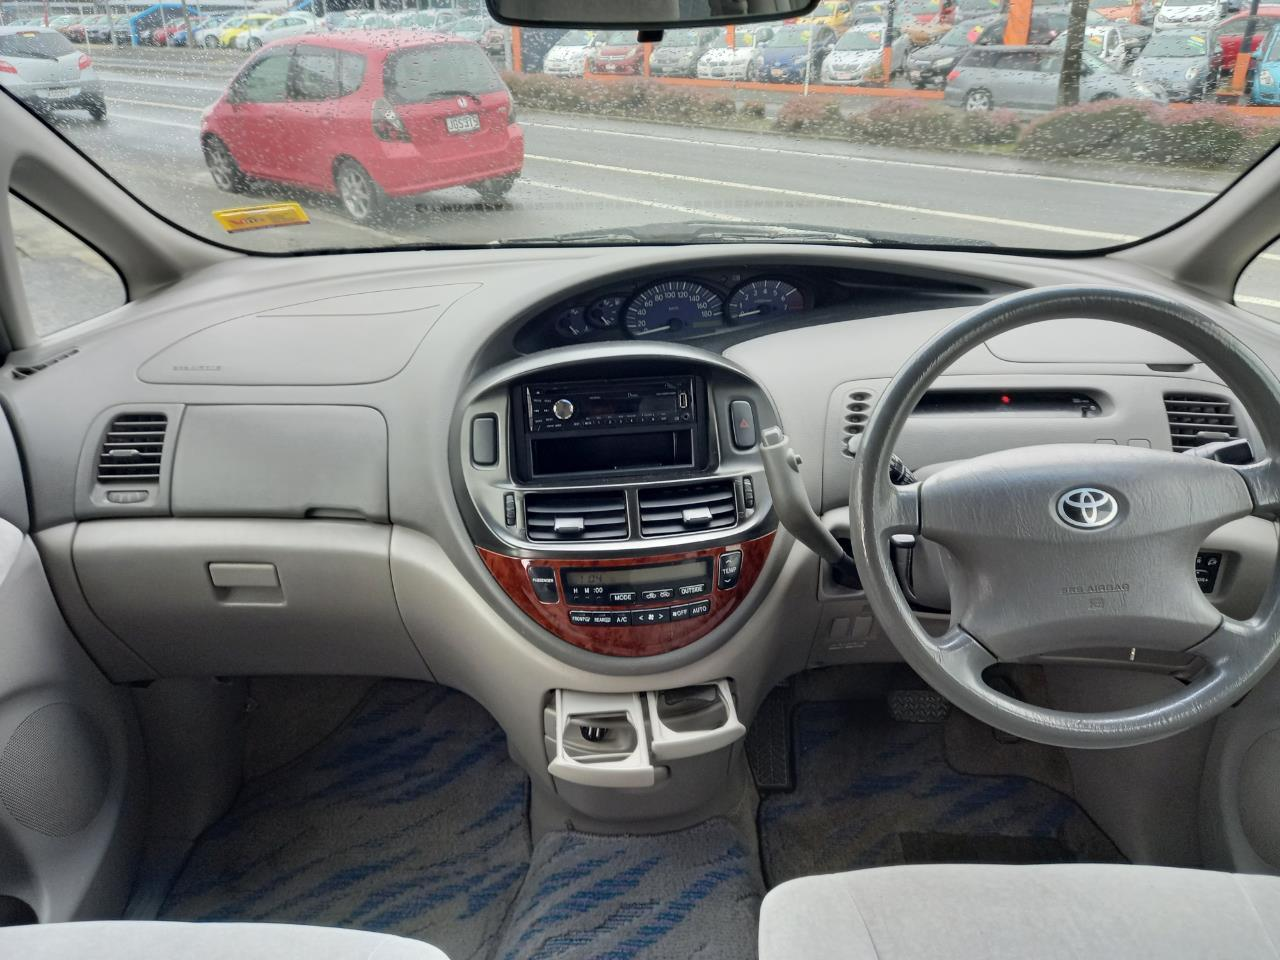 image-12, 2001 Toyota Estima 8 Seats No Deposit Finance at Dunedin